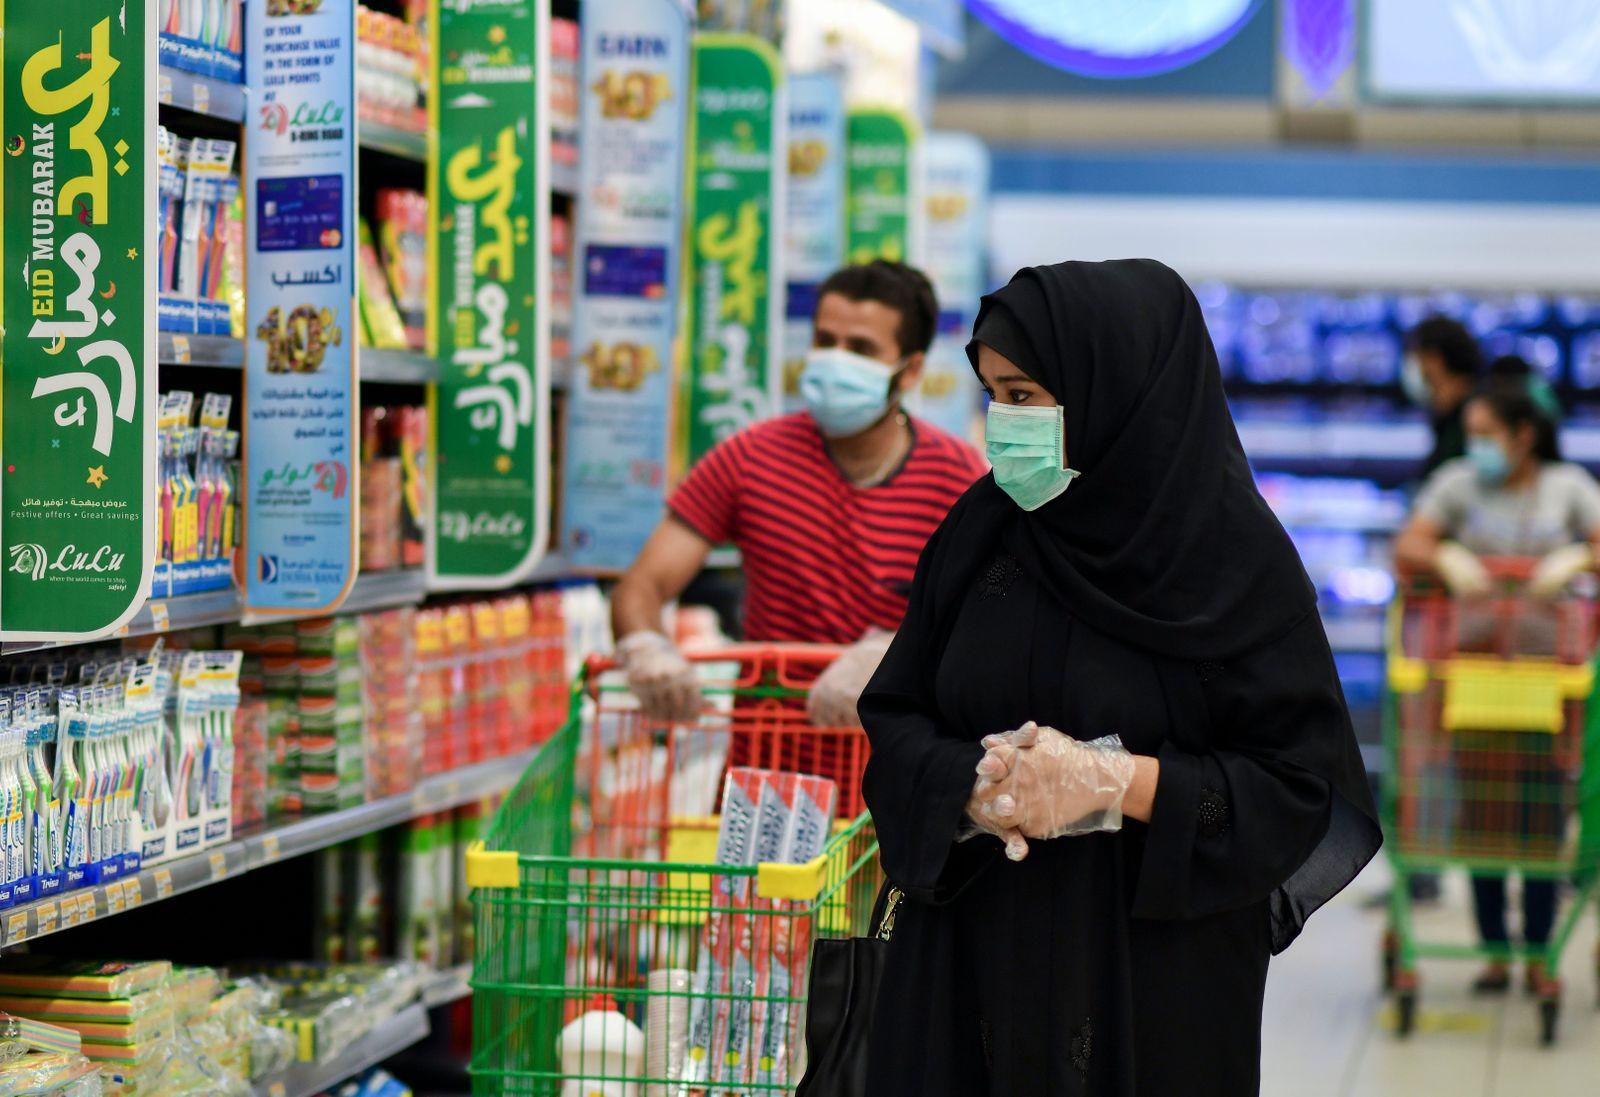 Daily life in Doha-Qatar during coronavirus pandemic - 23 May 2020